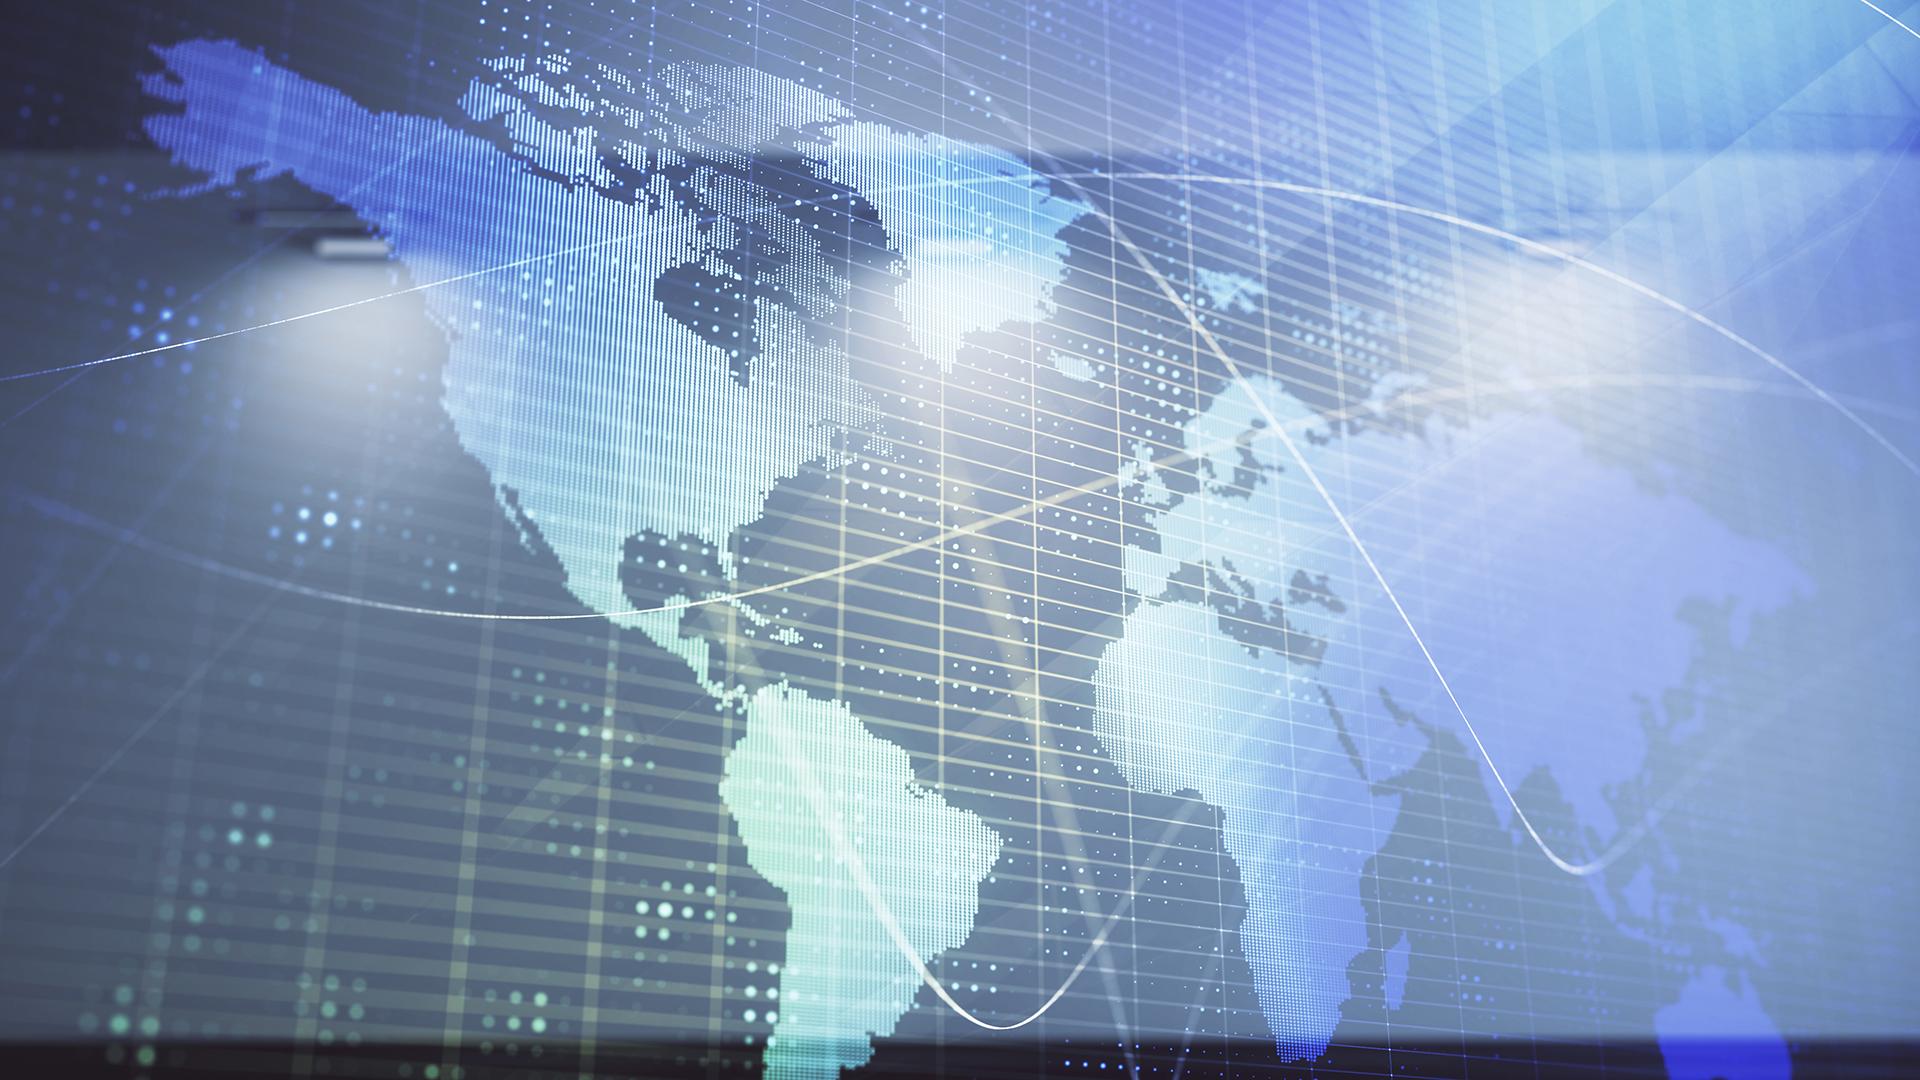 Digital map of the globe